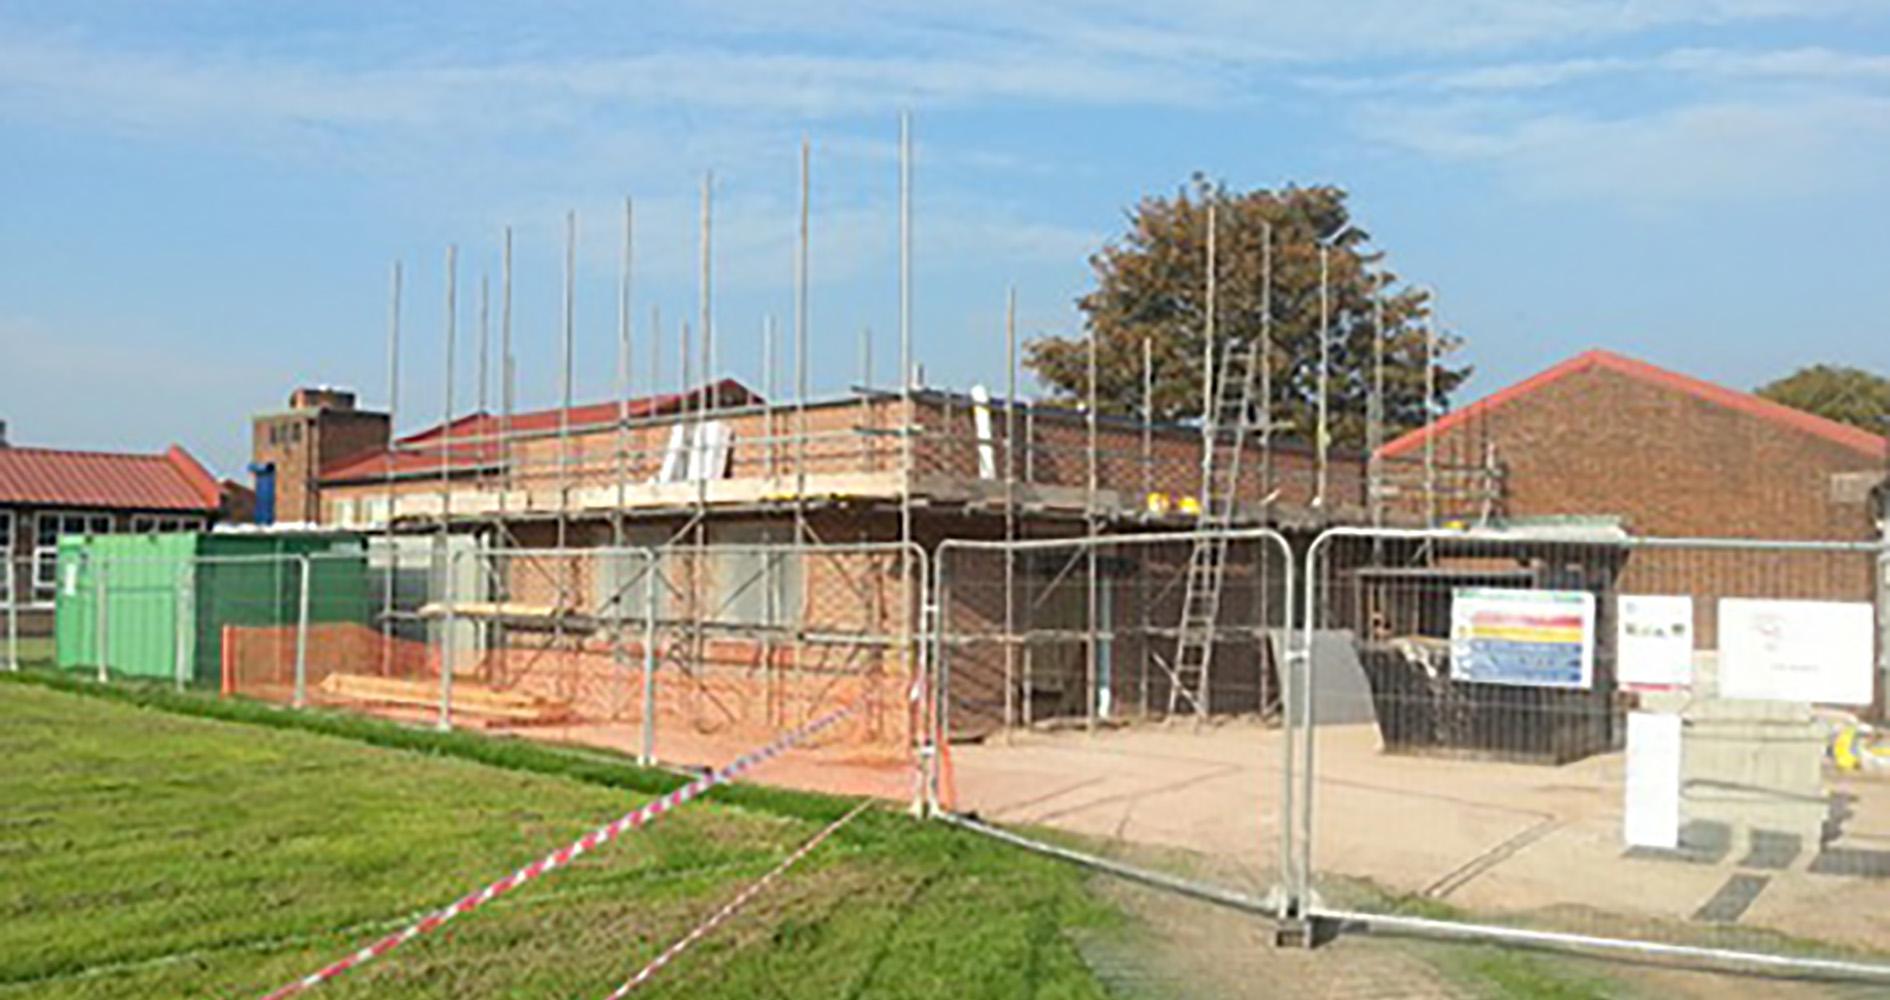 Meadow Bank Primary School